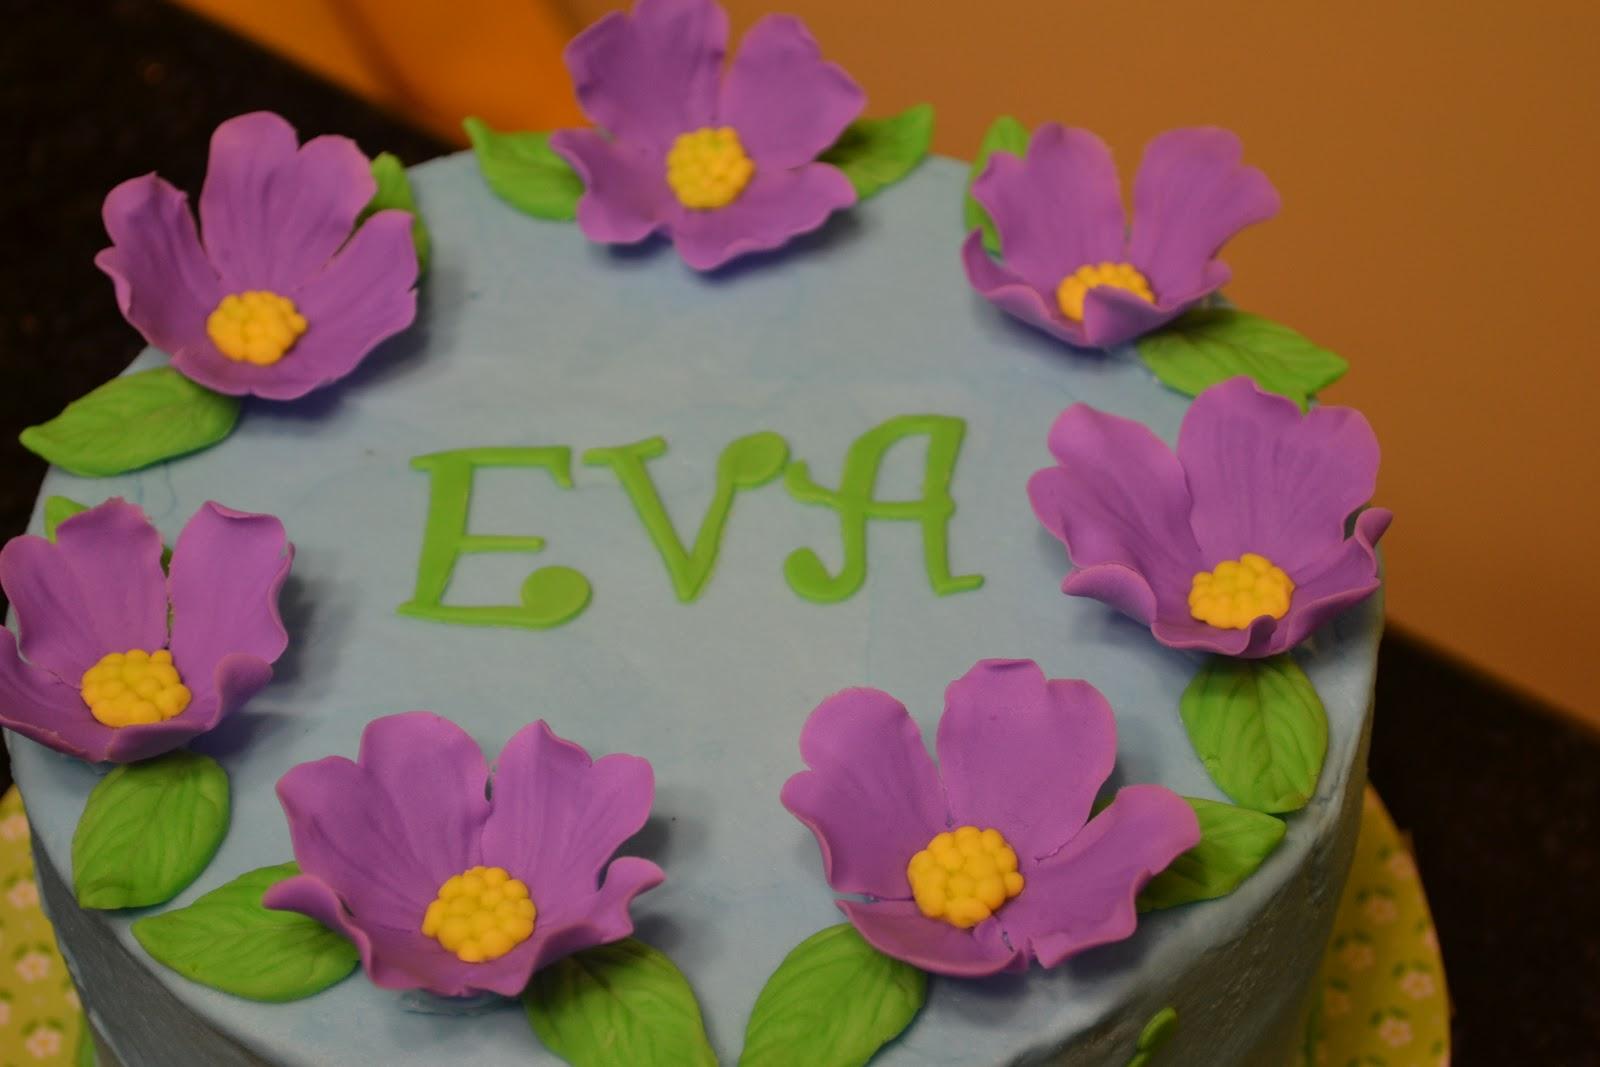 Cakes by Lala Evas 7th birthday purple flower cake